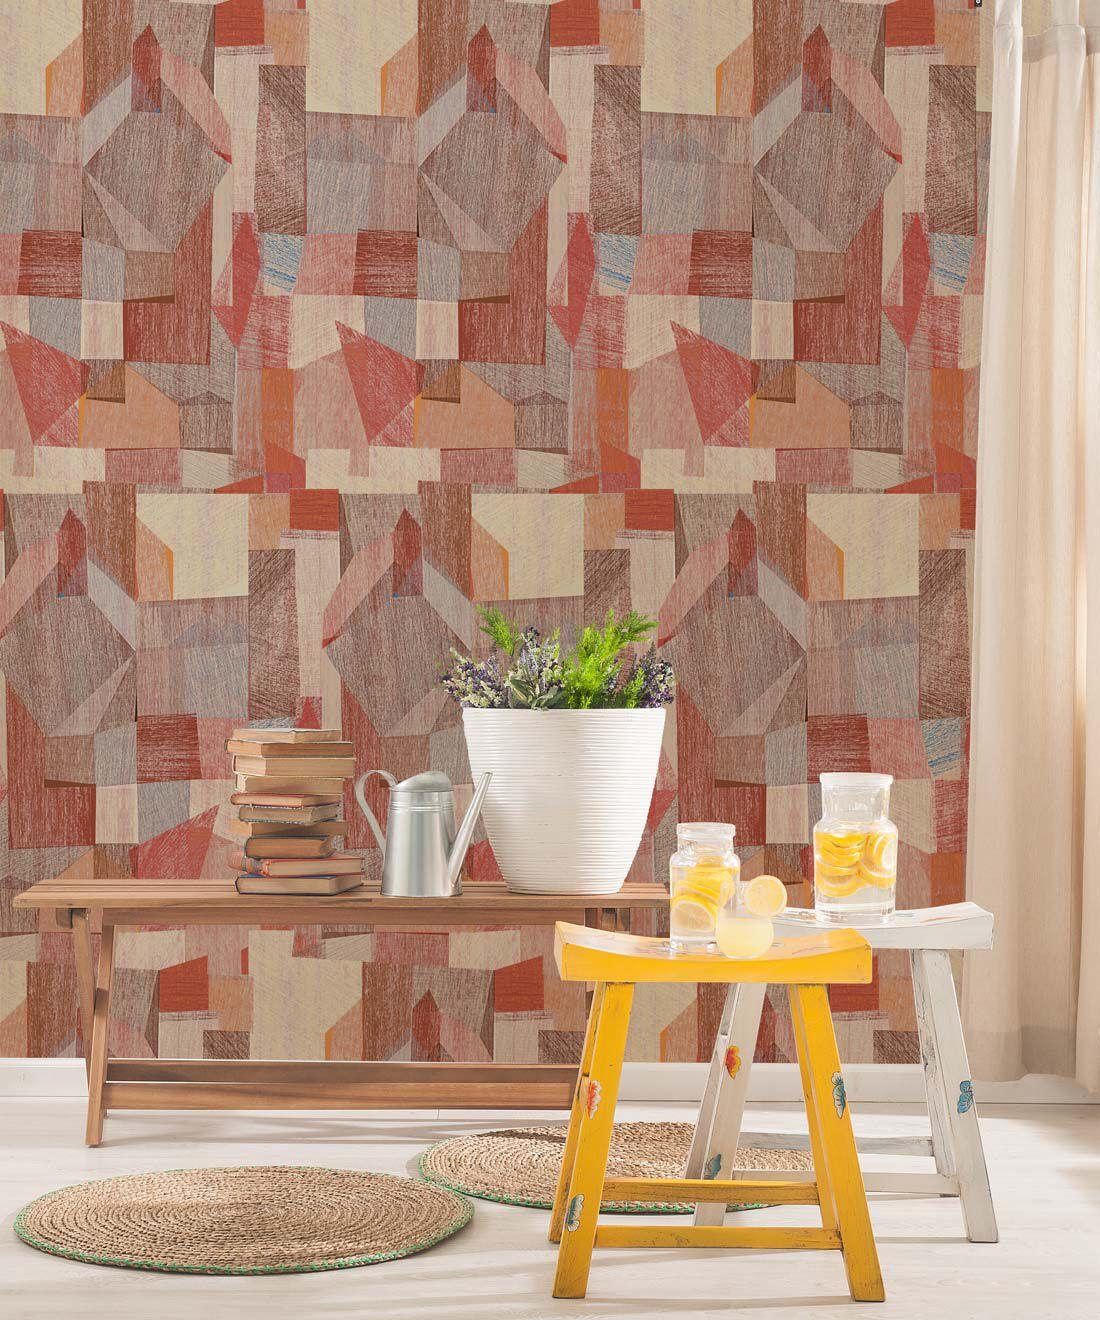 Chimera Wallpaper by Simcox • Color Rust • Abstract Wallpaper • Geometric Wallpaper • insitu